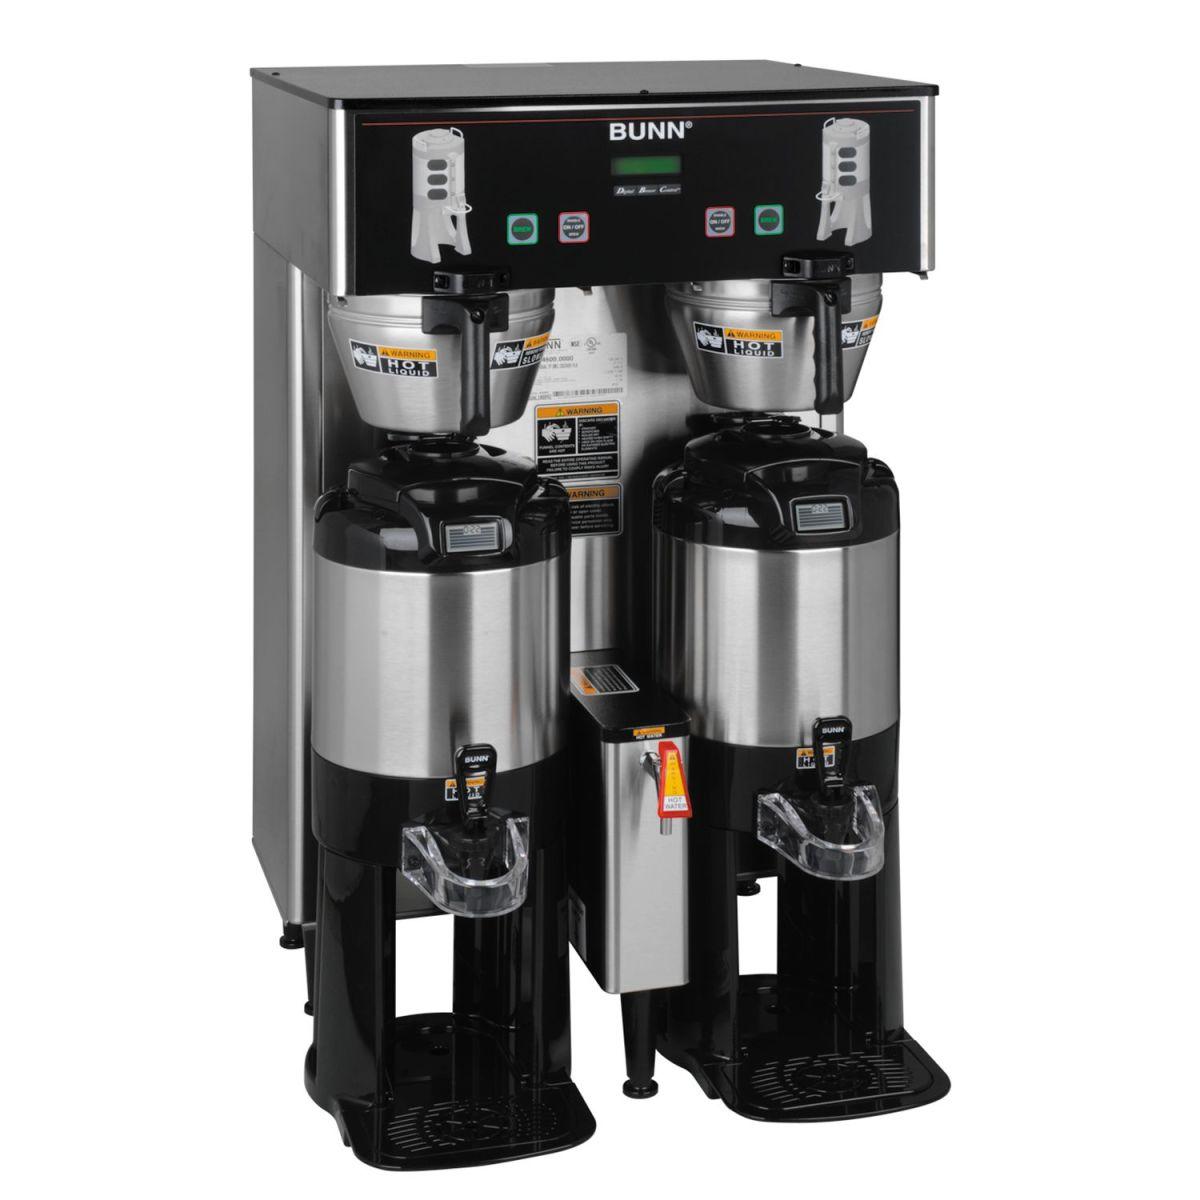 BUNN DUAL Filter Coffee brewer